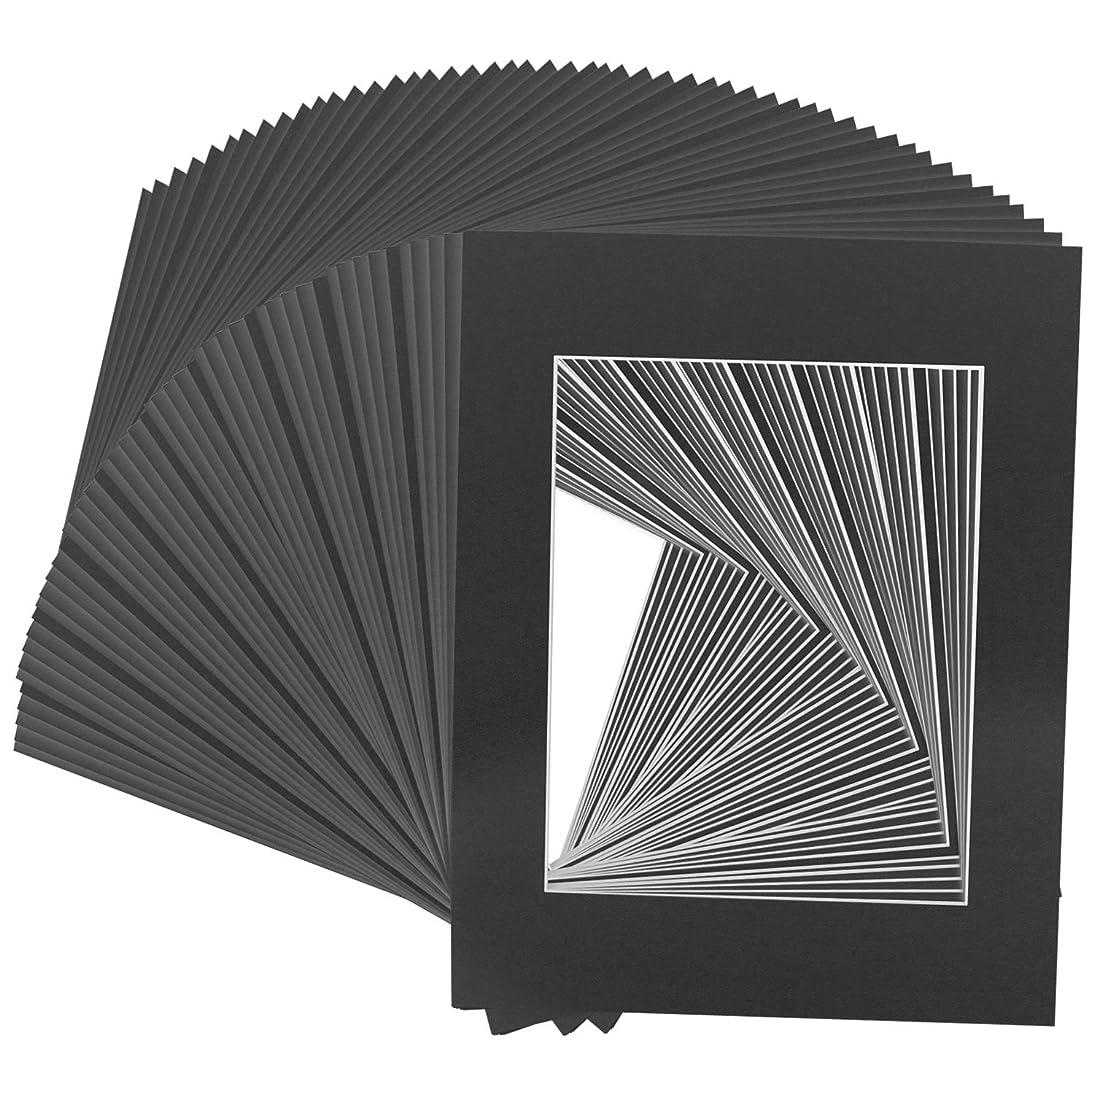 US Art Supply Art Mats Brand Premier Acid-Free Pre-Cut 8x10 Black Picture Mat Matte Face Frames. Includes a Pack of 50 White Core Bevel Cut Matte Frames for 5x7 Photos